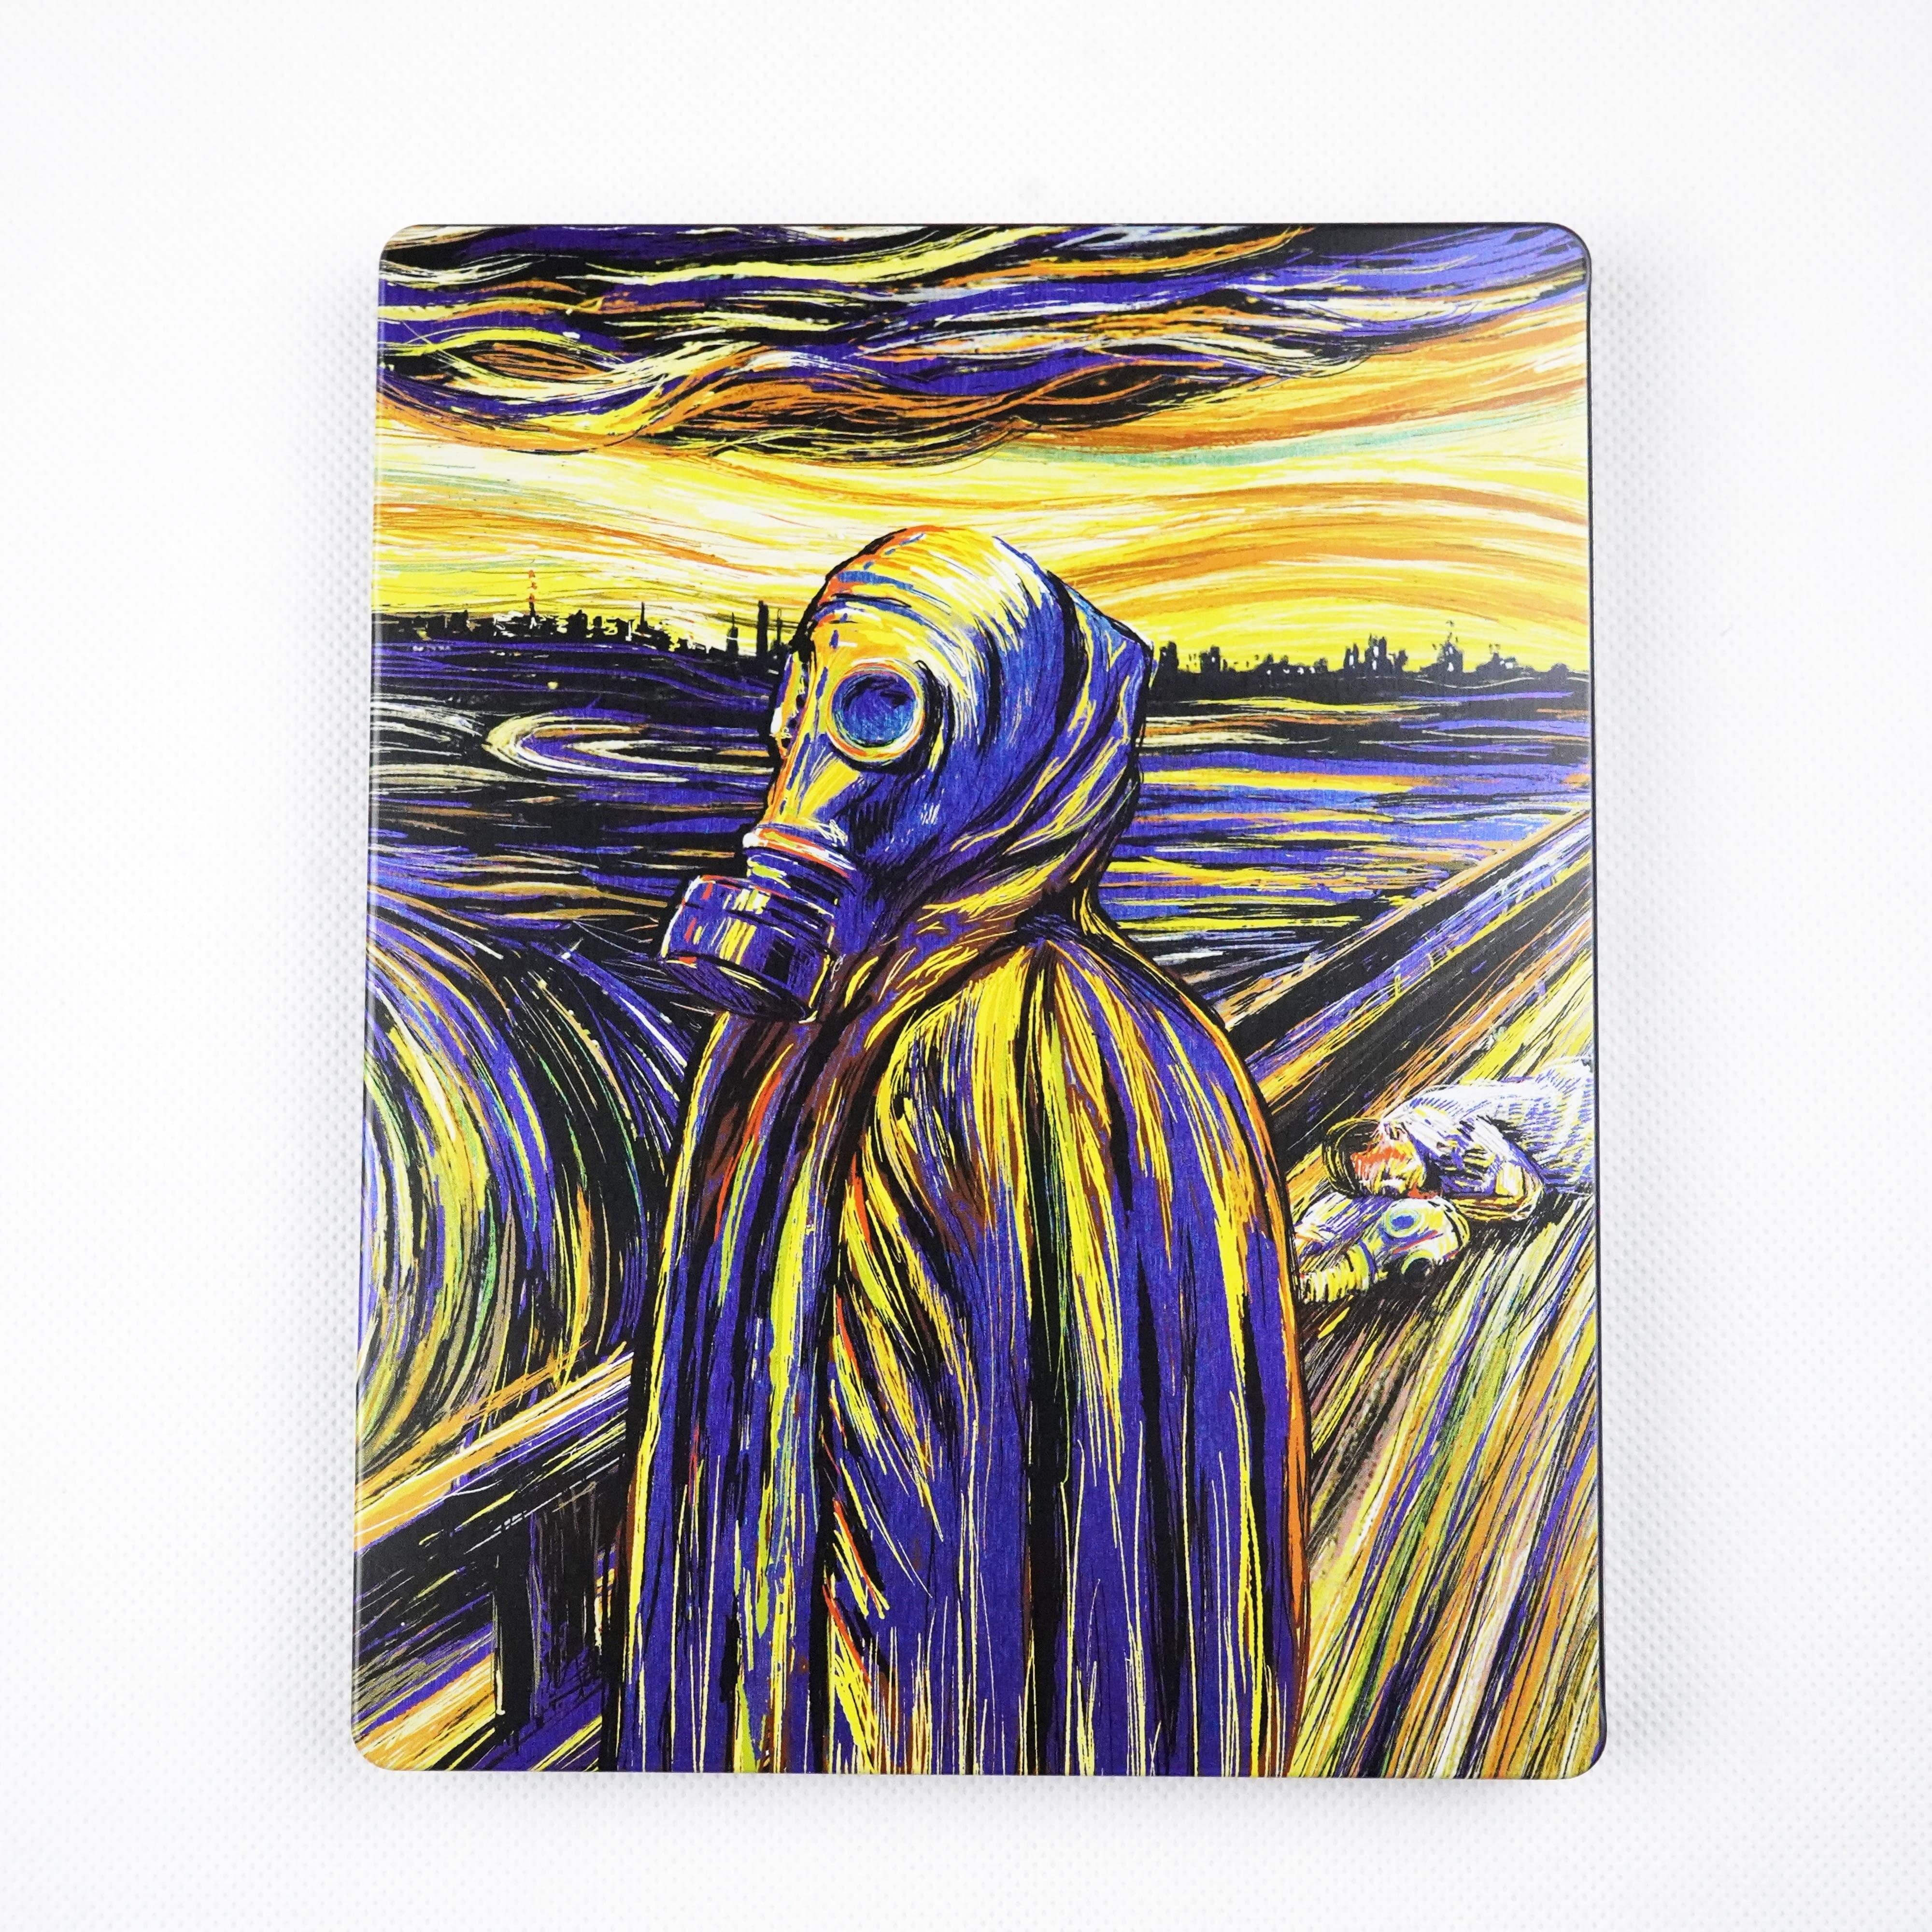 czarnobyl-blu-ray-steelbook-03-min.jpg